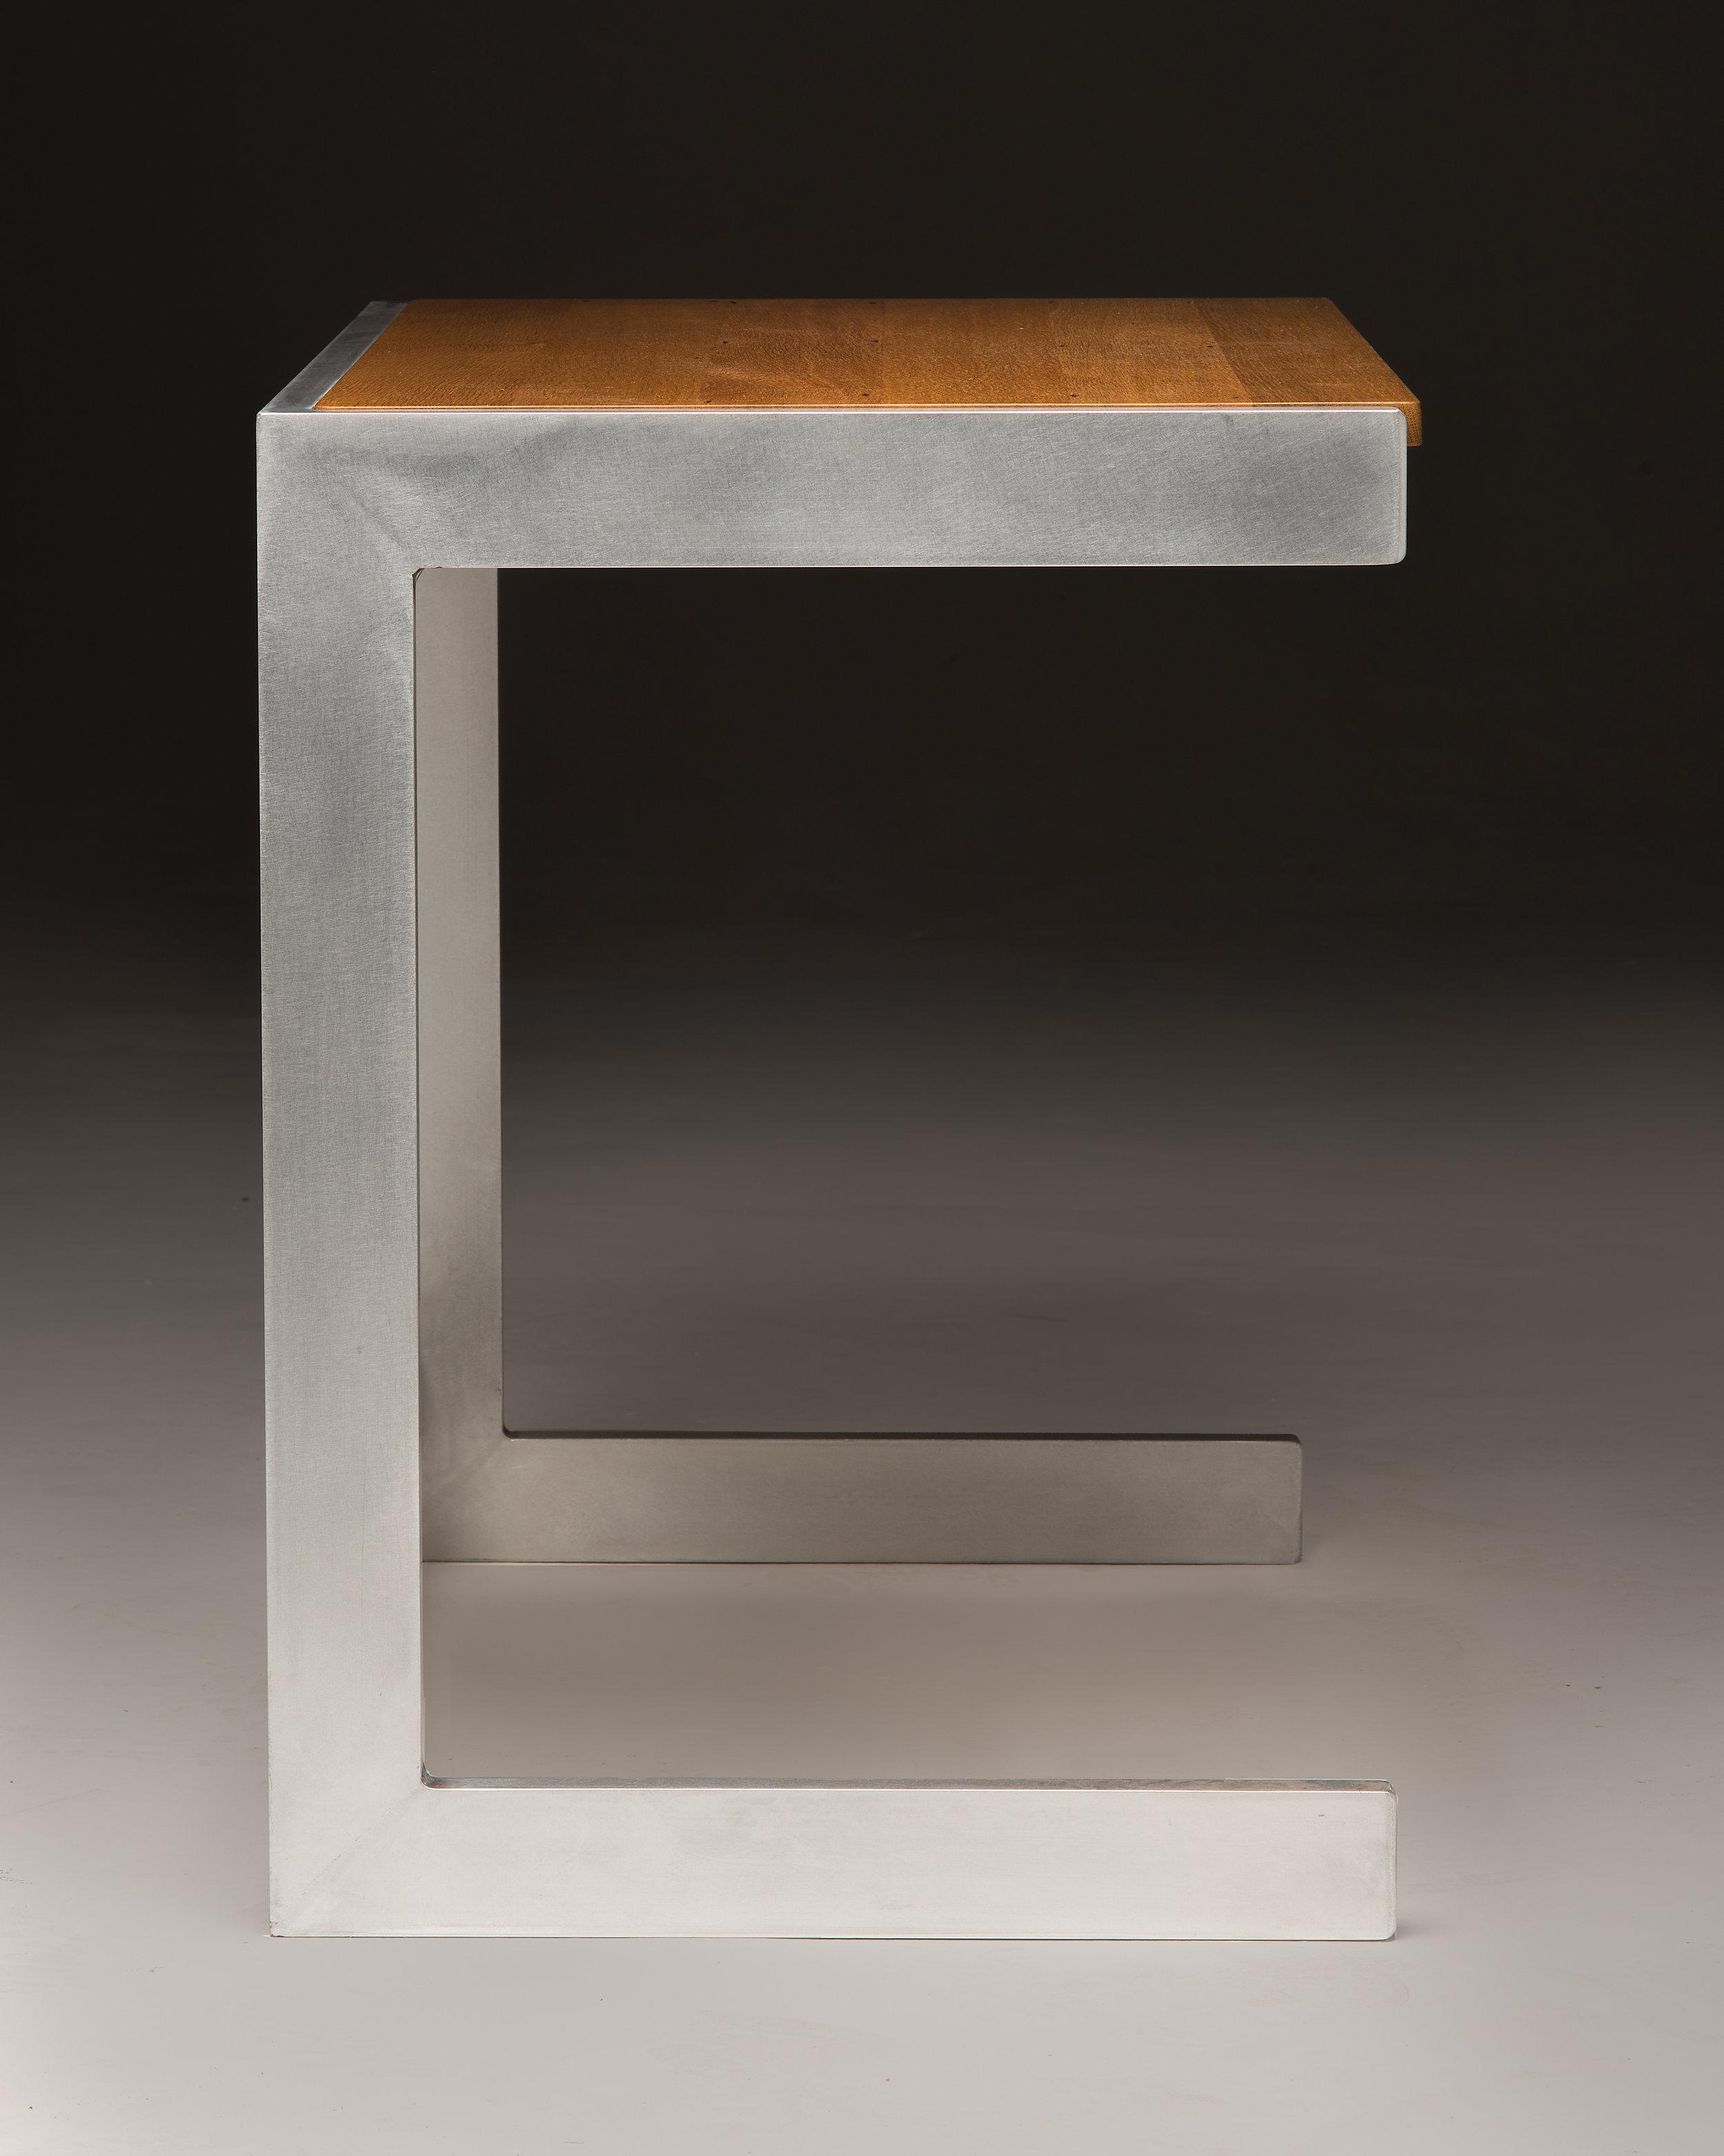 Cantilever Aluminum Desk Minimalist Contemporary Reclaimed Oak Wood